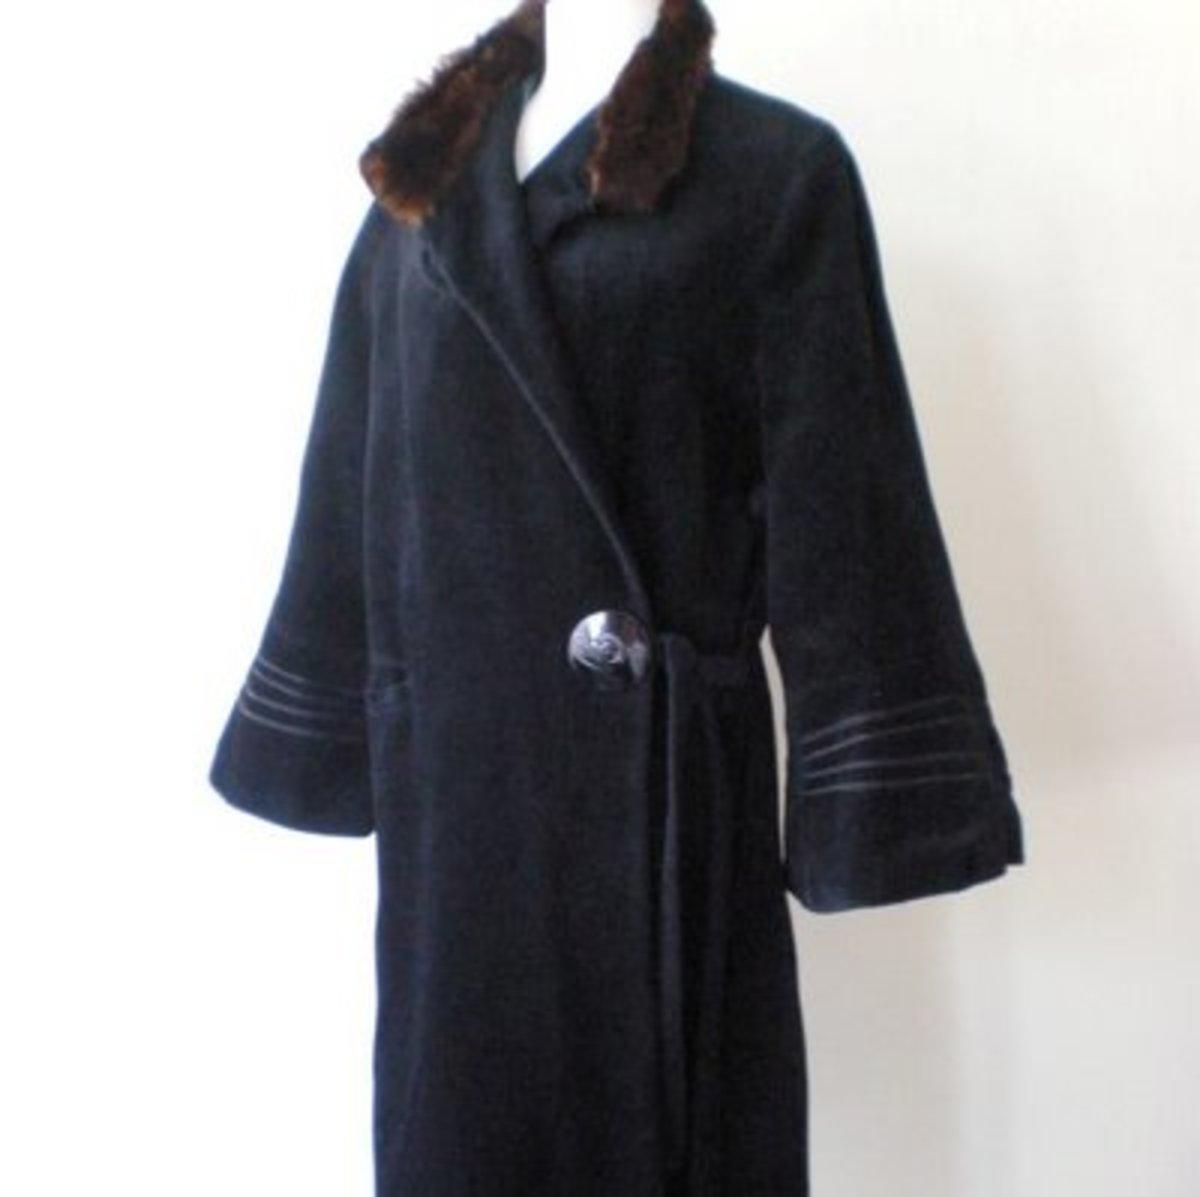 Typical 20's coat